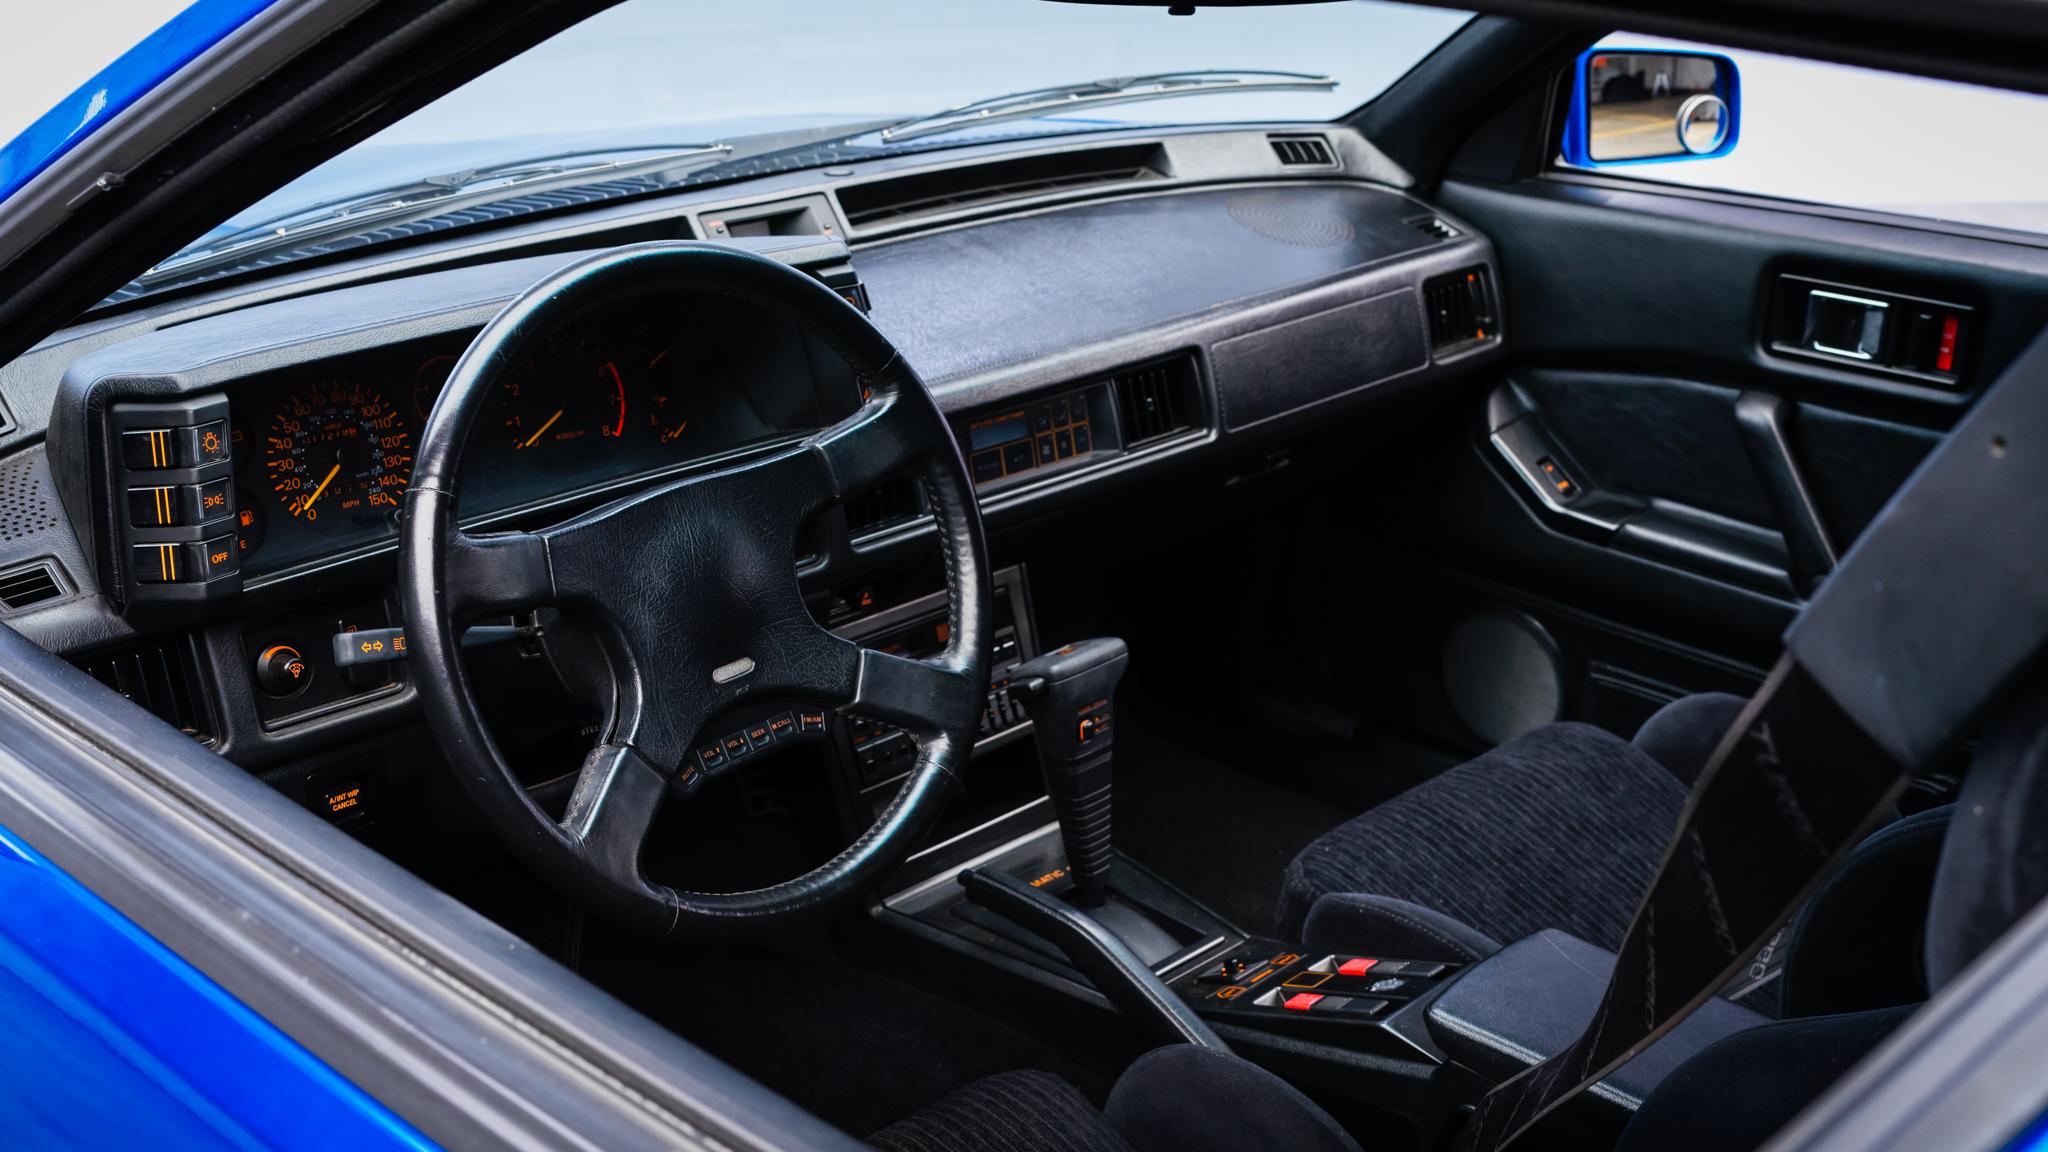 1988 Chrysler Conquest TSi interior